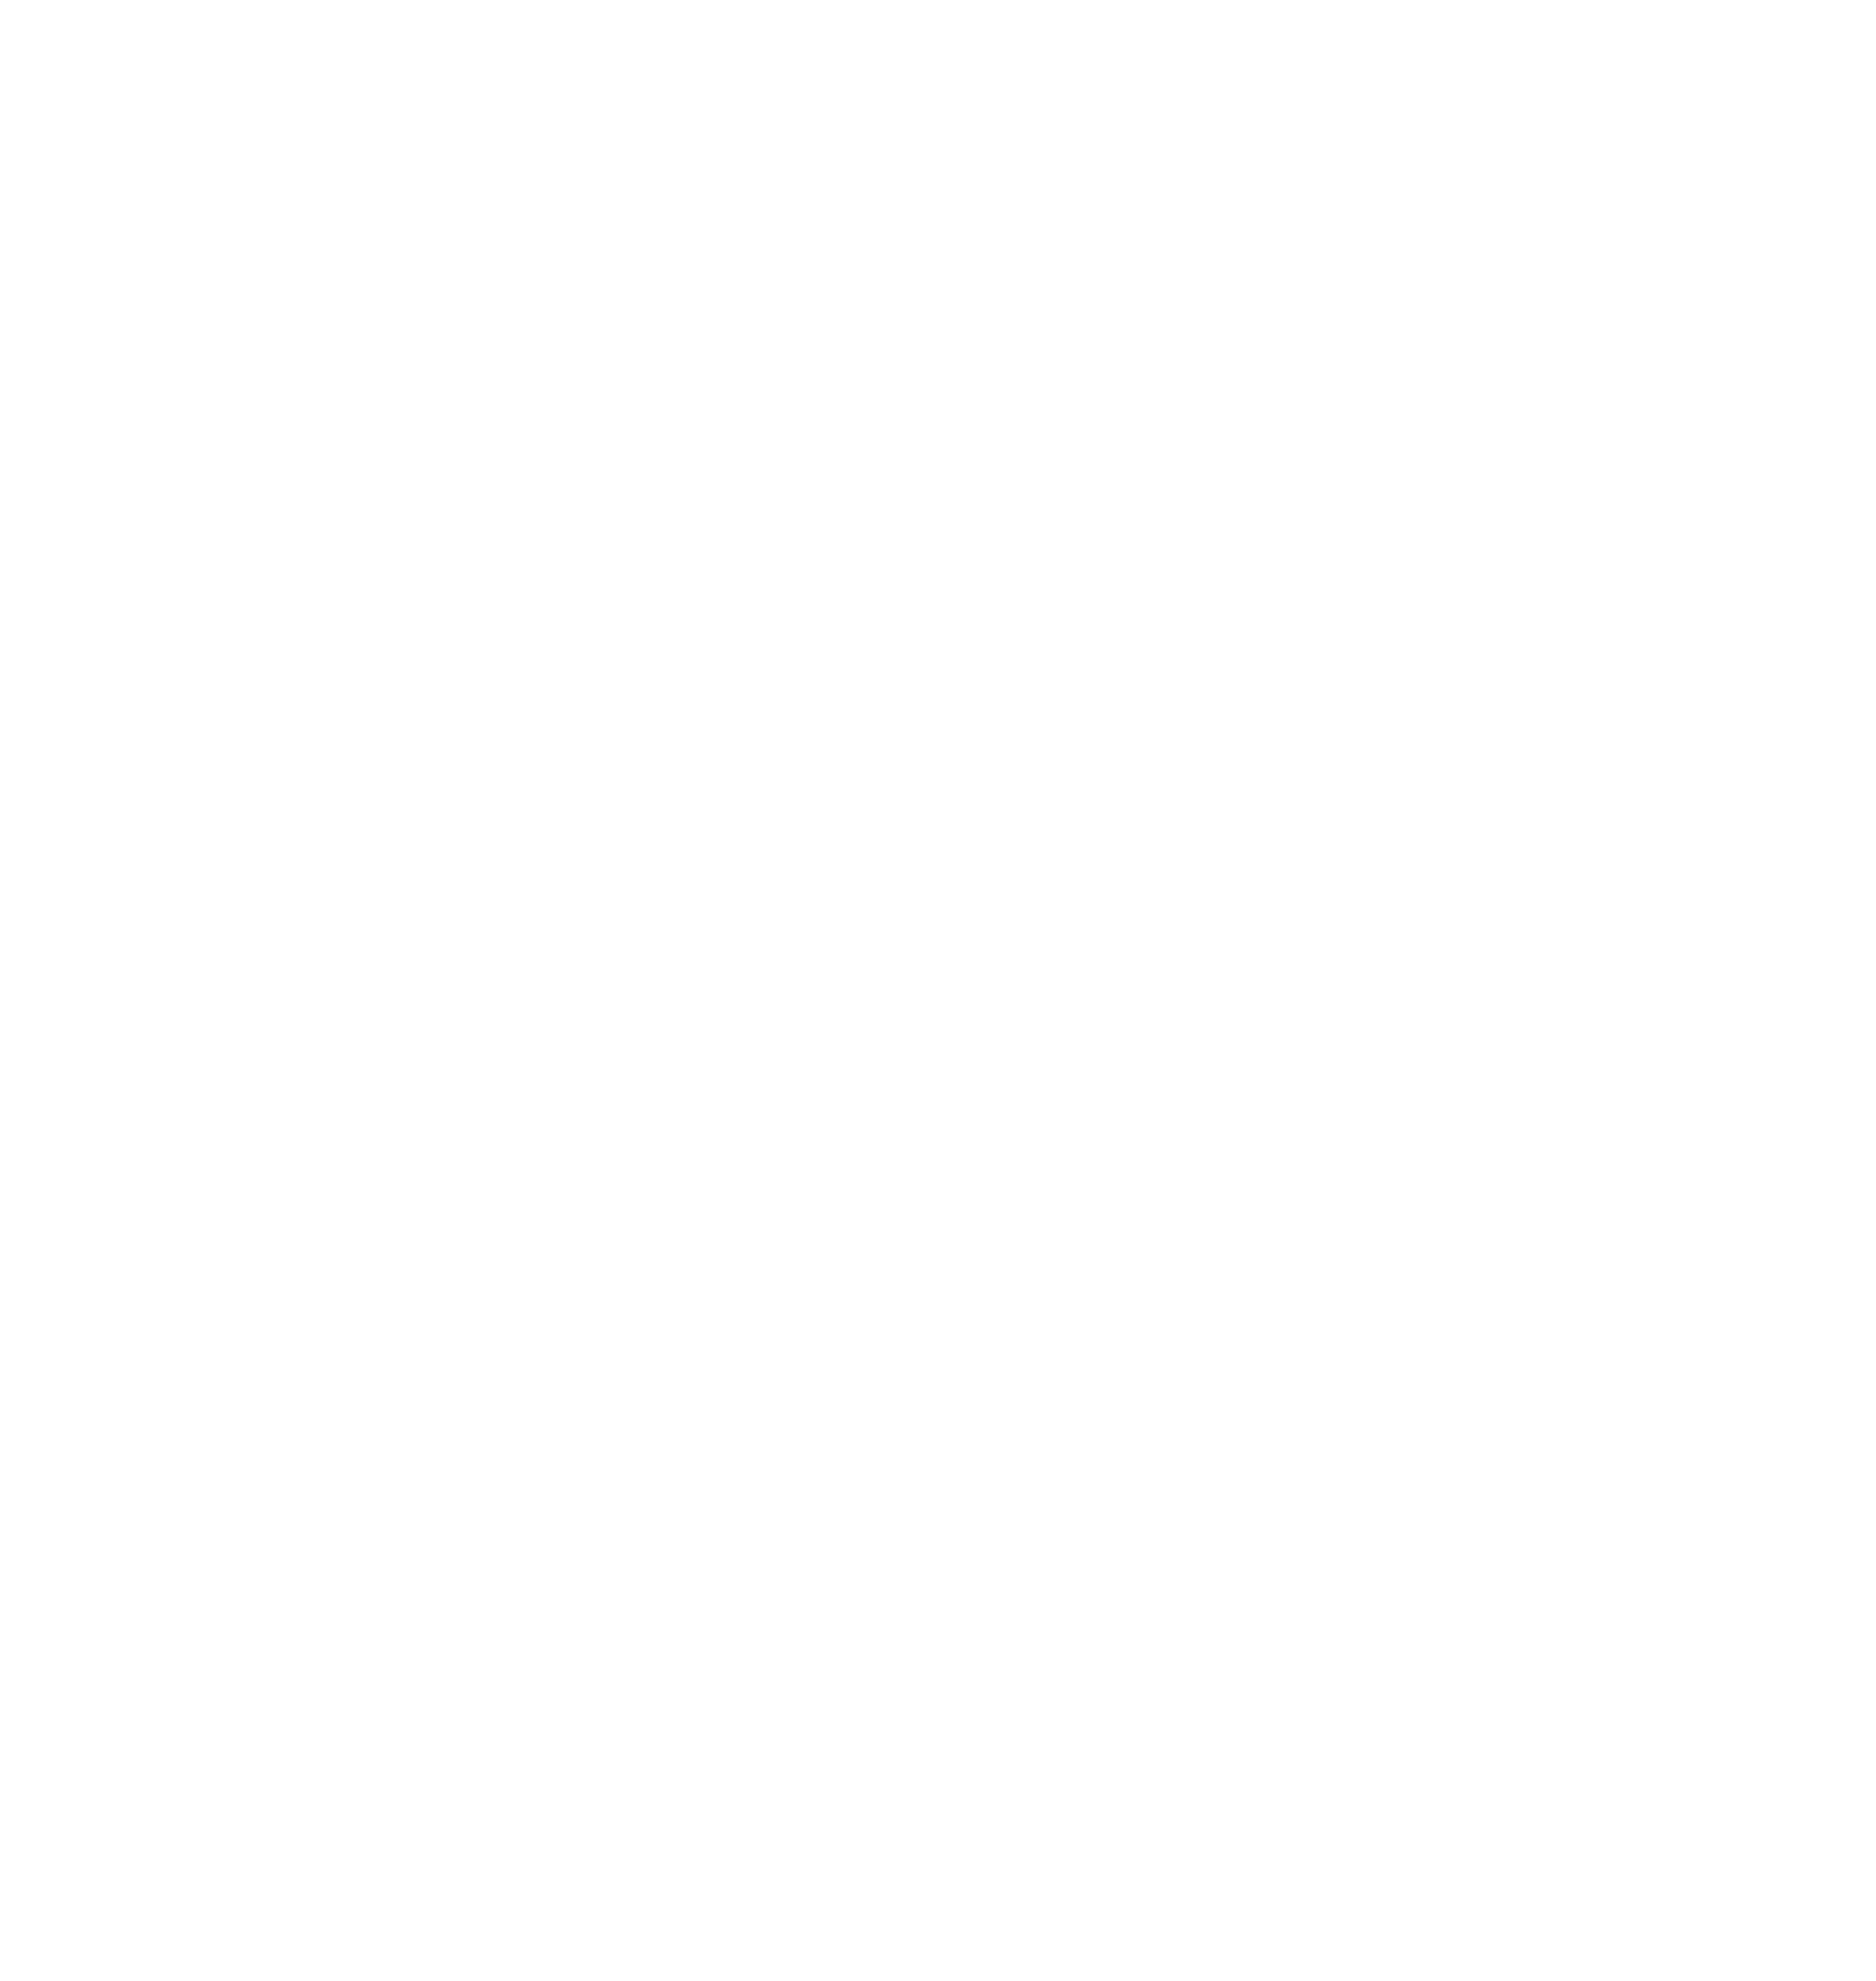 Corner clipart stencil. White floral png clip